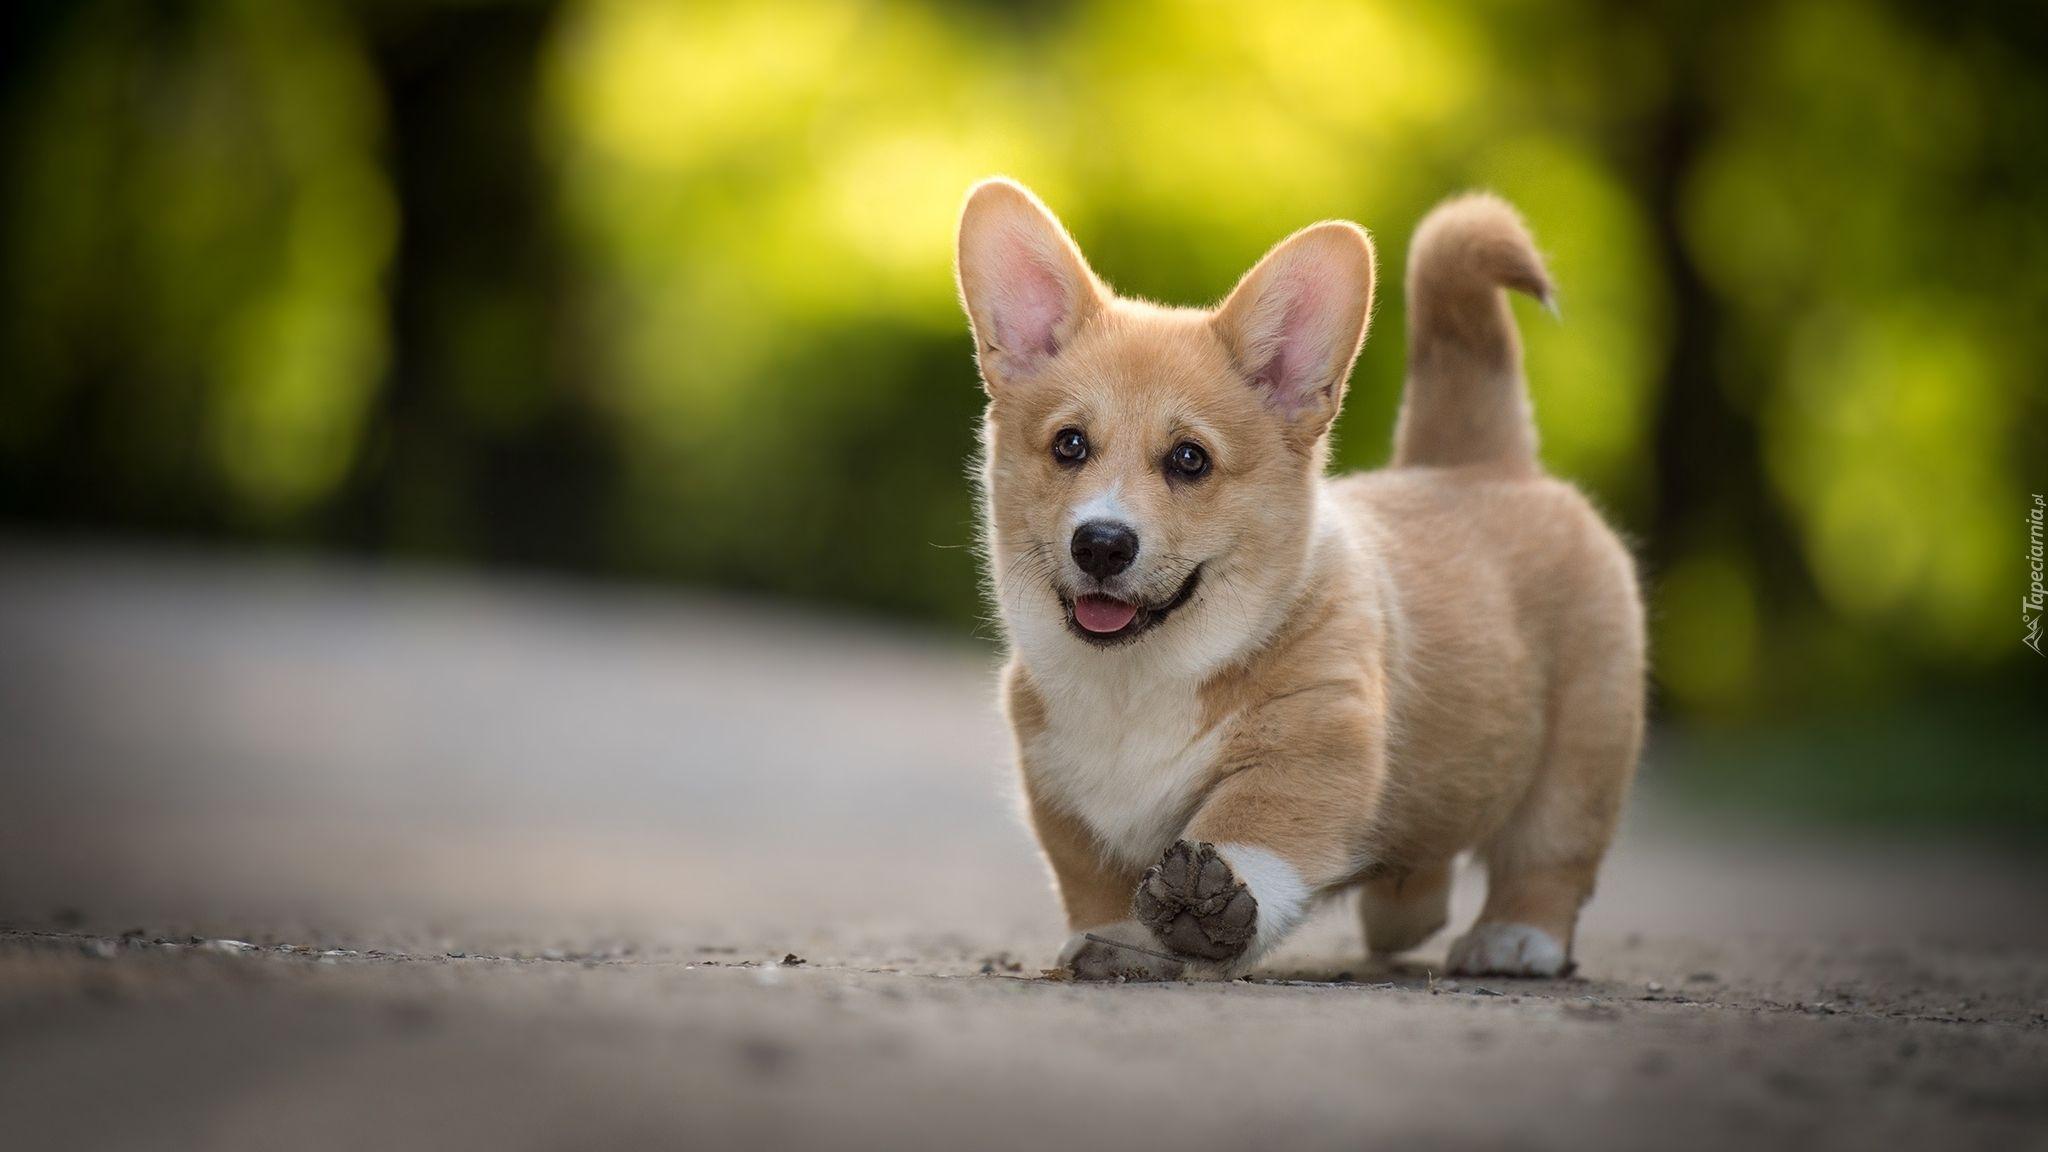 Pies Szczeniak Welsh Corgi Pembroke ペット ペット用品